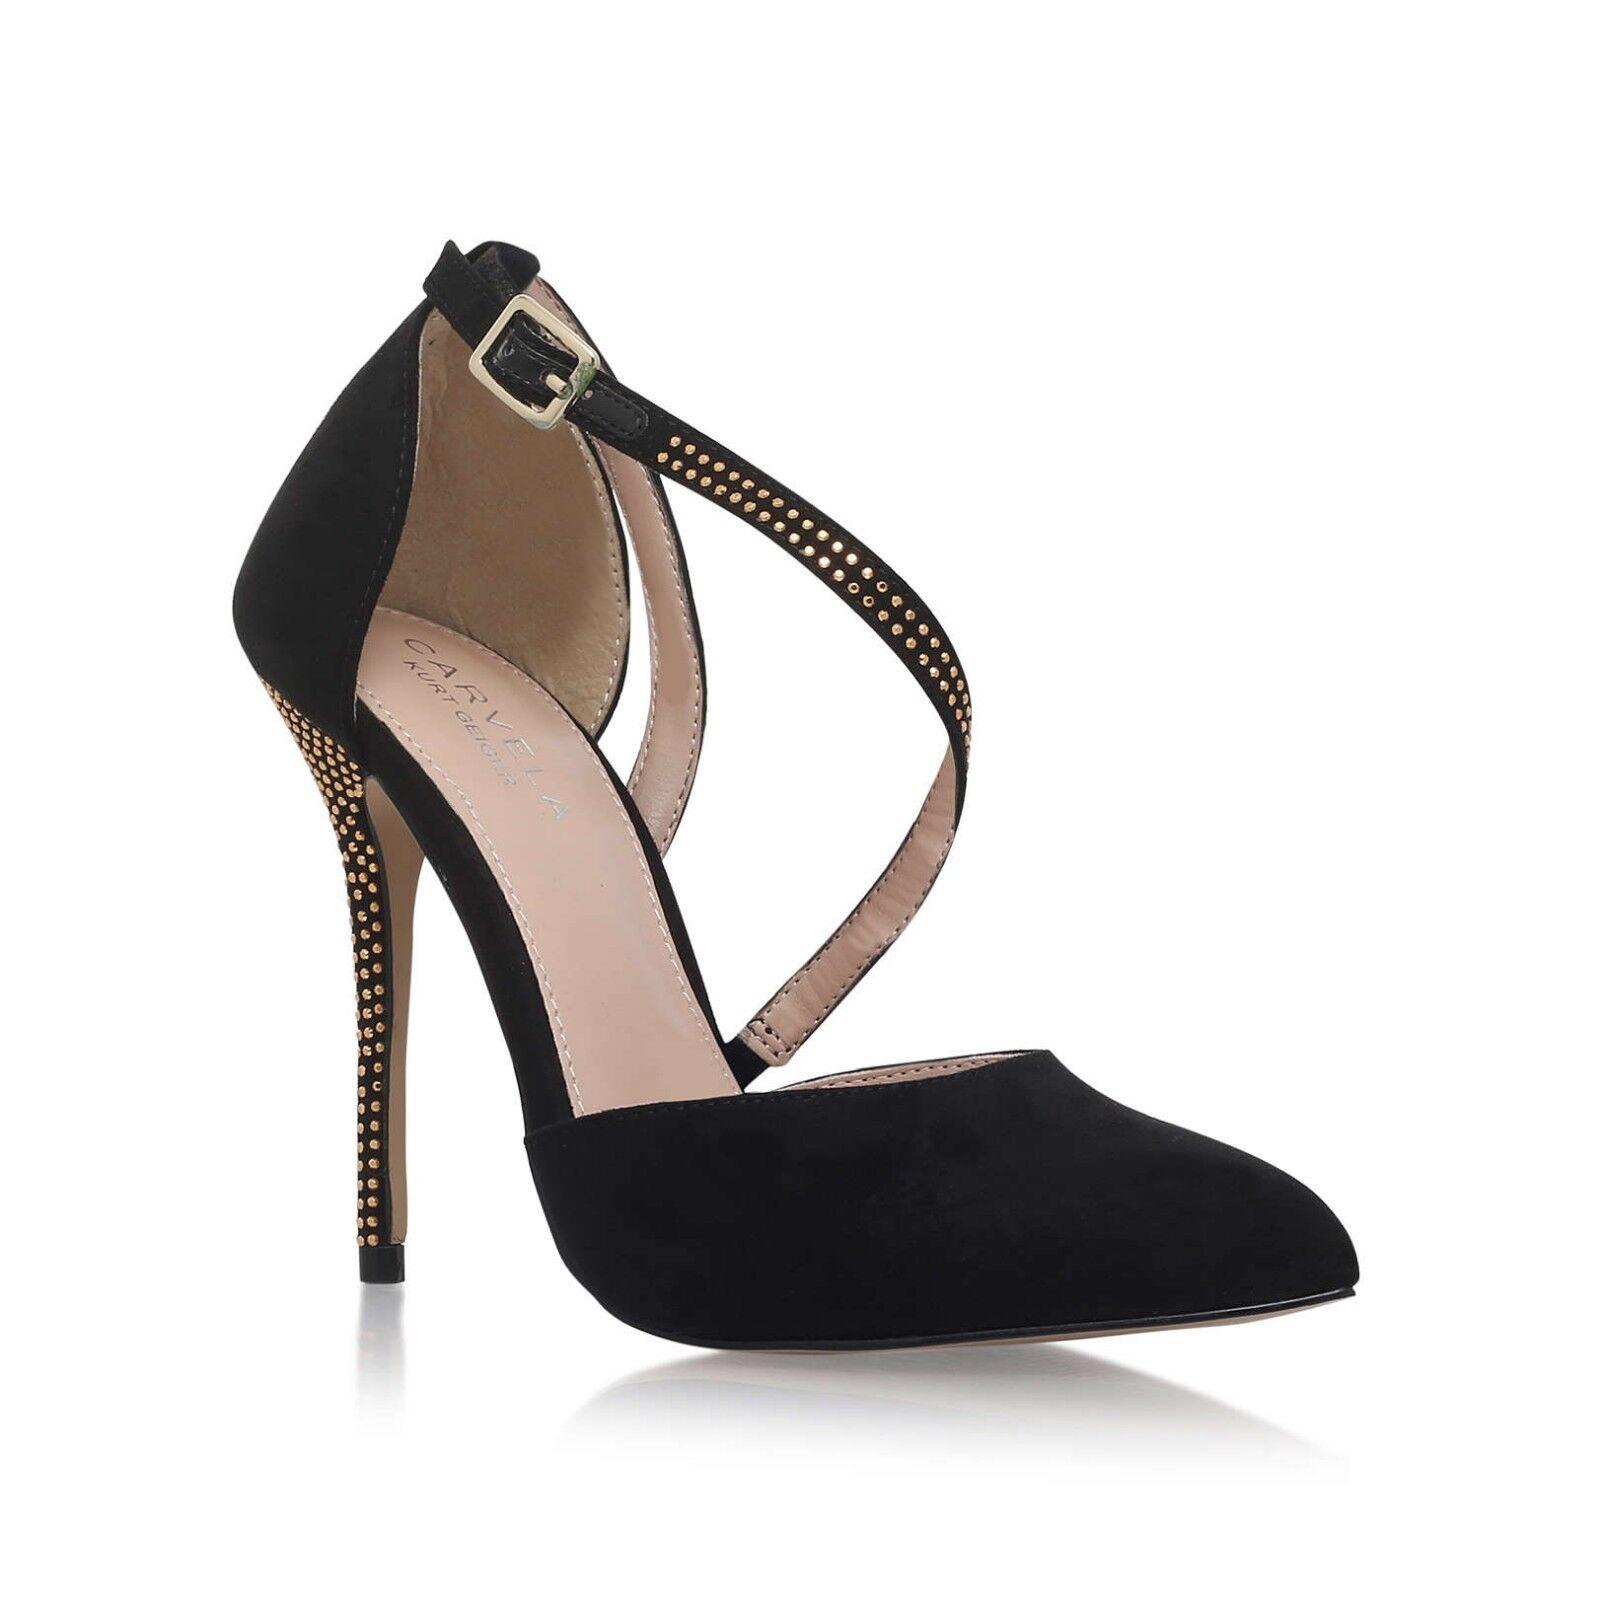 Black High Heel Court Shoes Kurt Geiger Carvela Size Size Carvela 6 Brand New RRP 011457